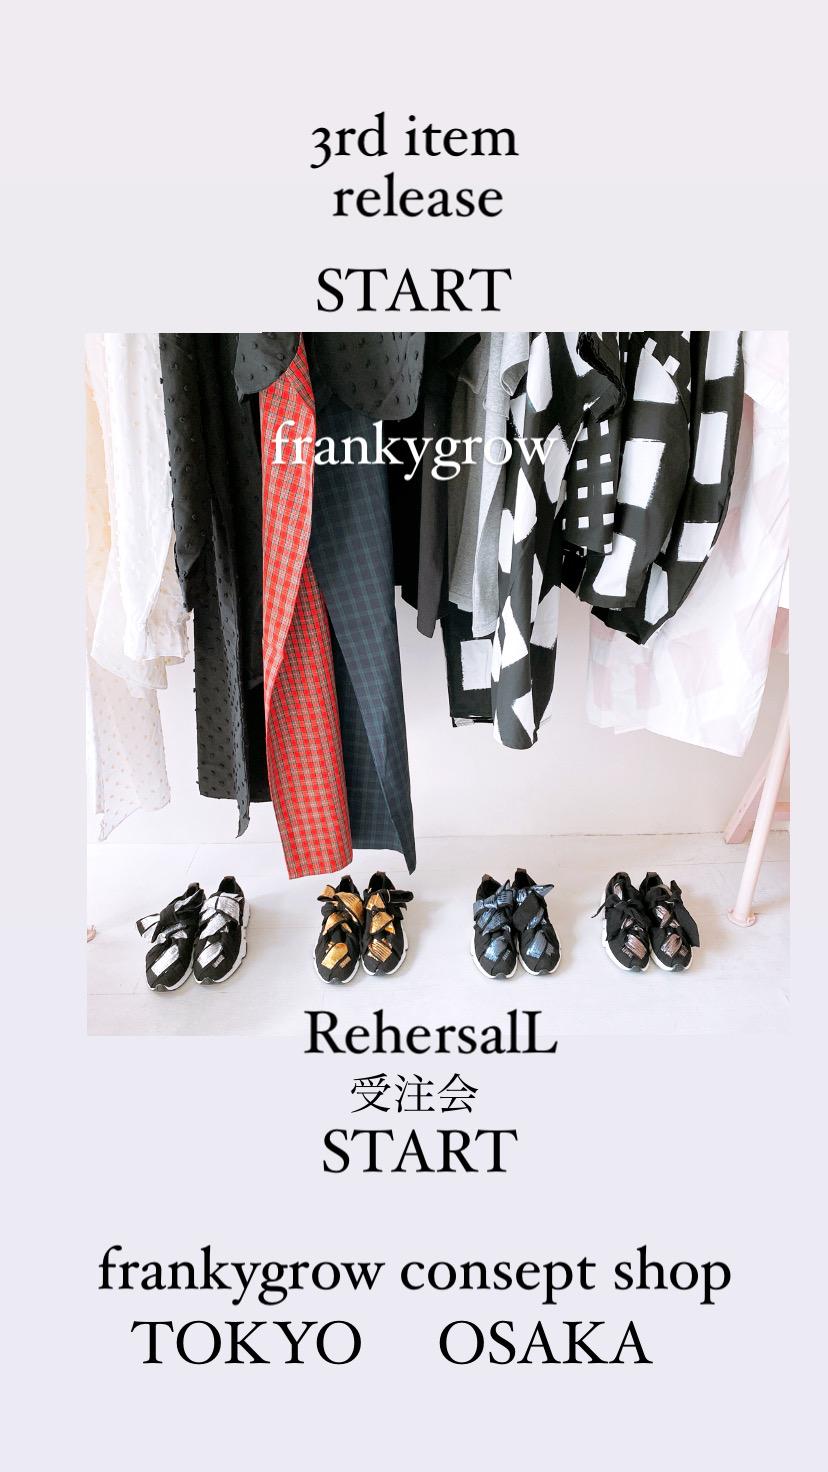 frankygrow+RehersalL coordinate